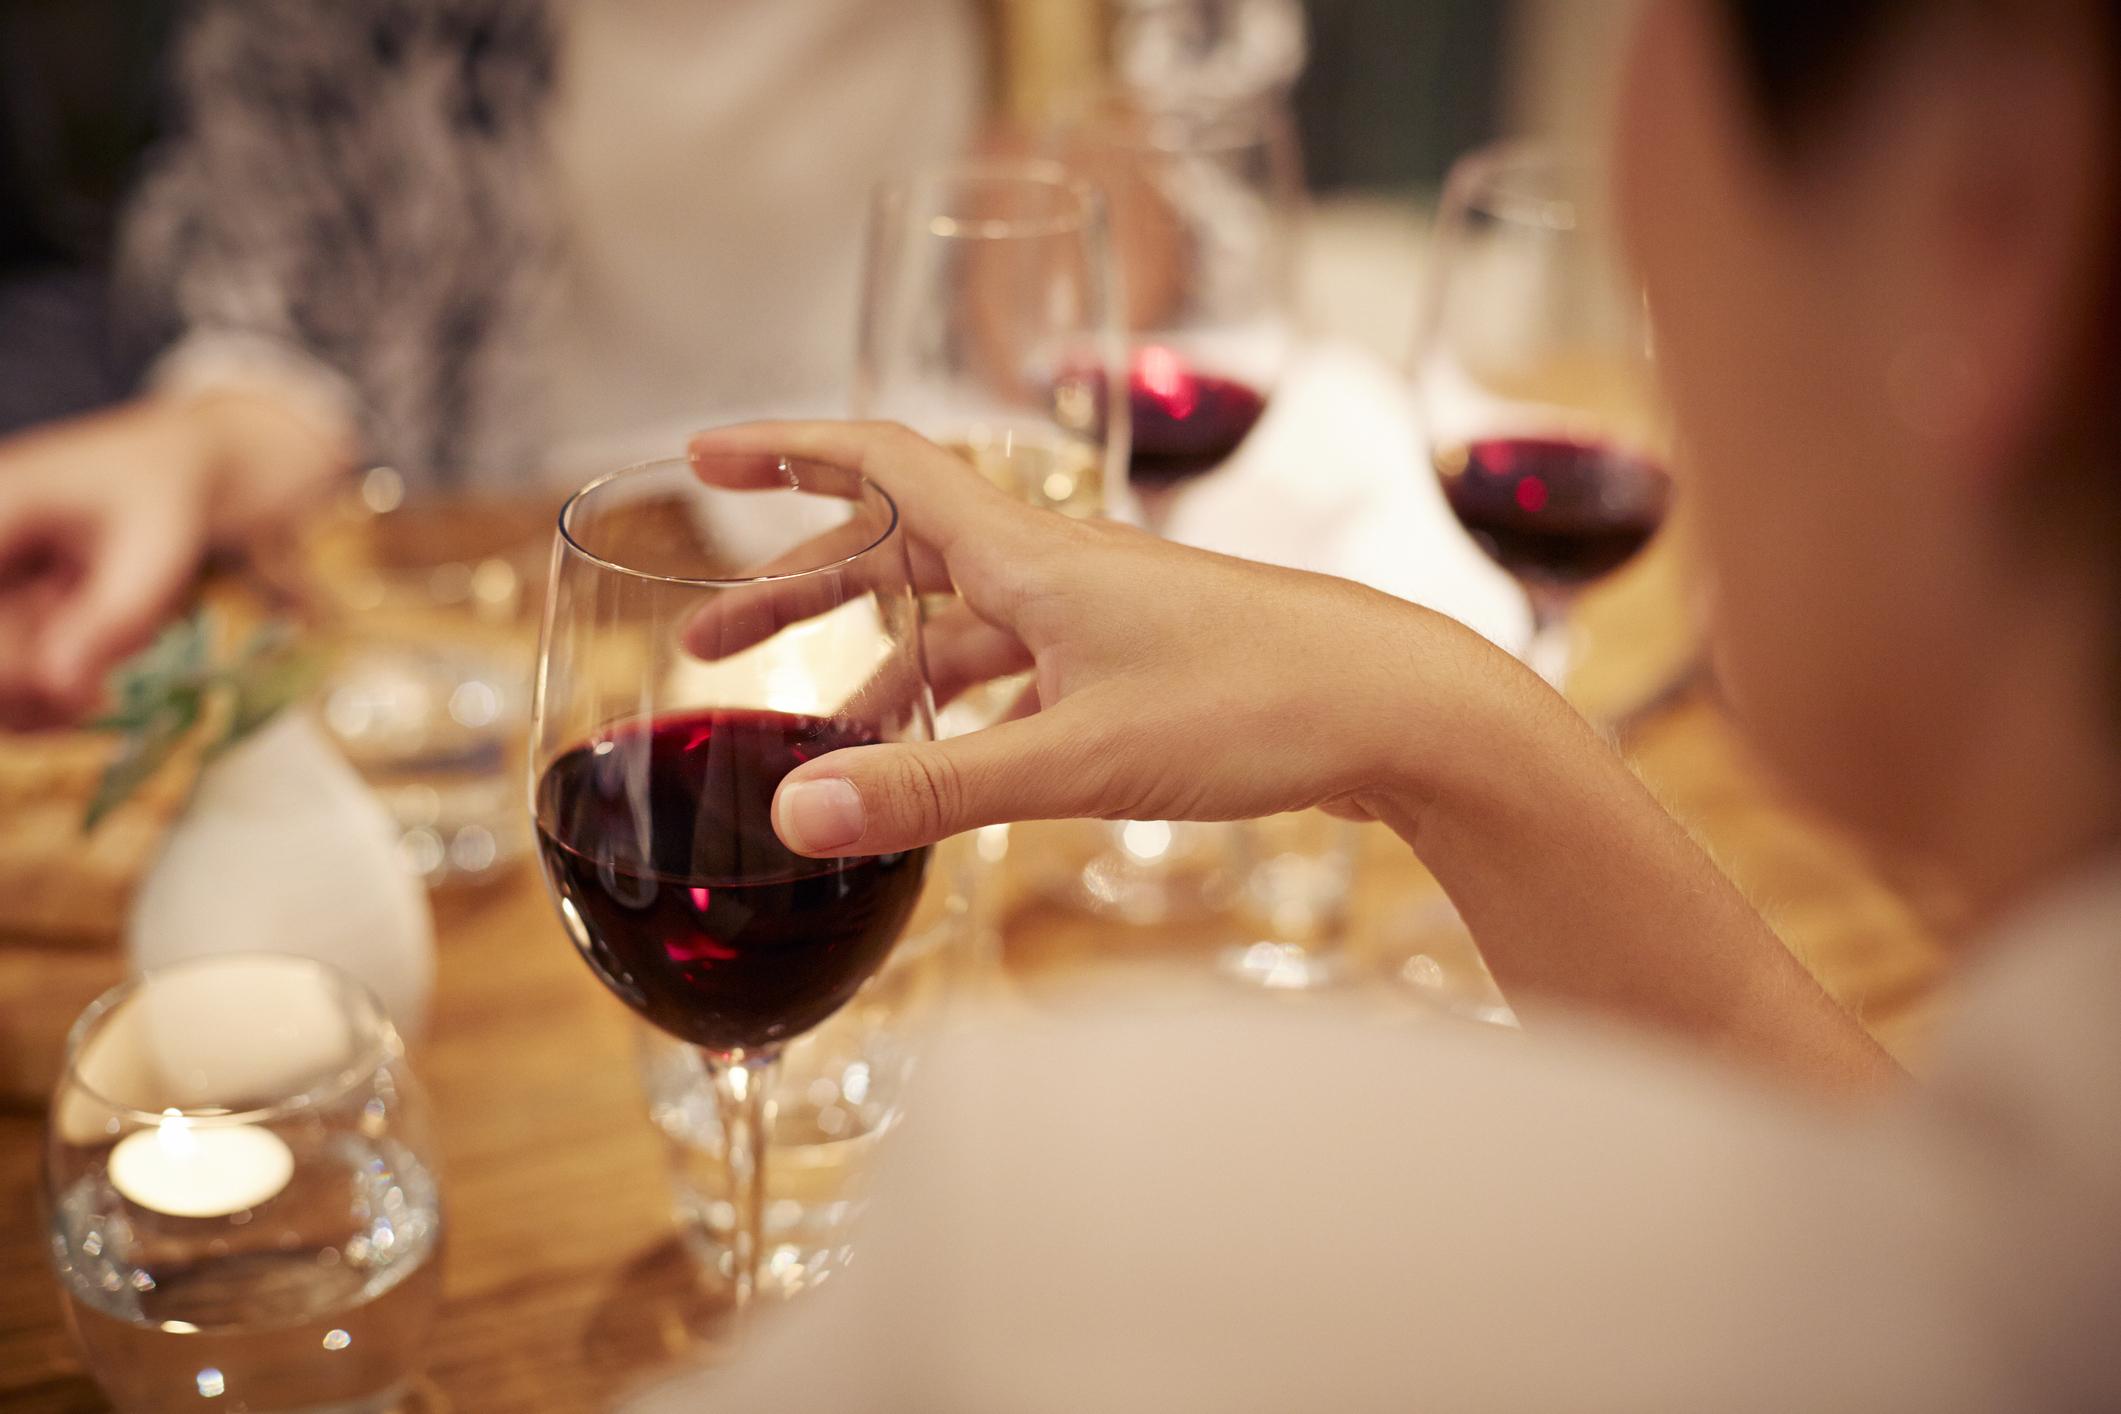 nok-alkohol